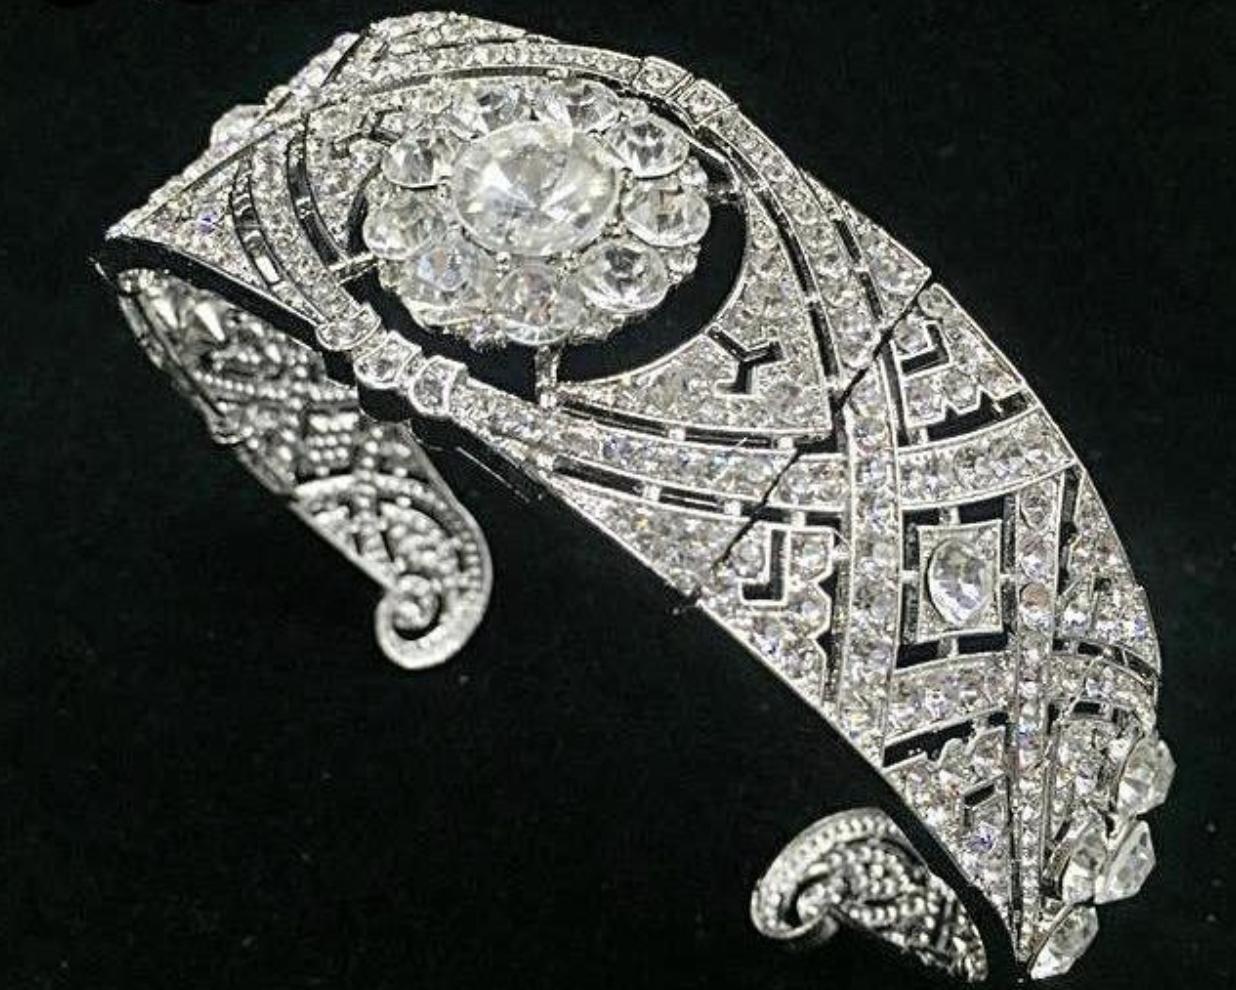 Meghan Markle Tiara Replica